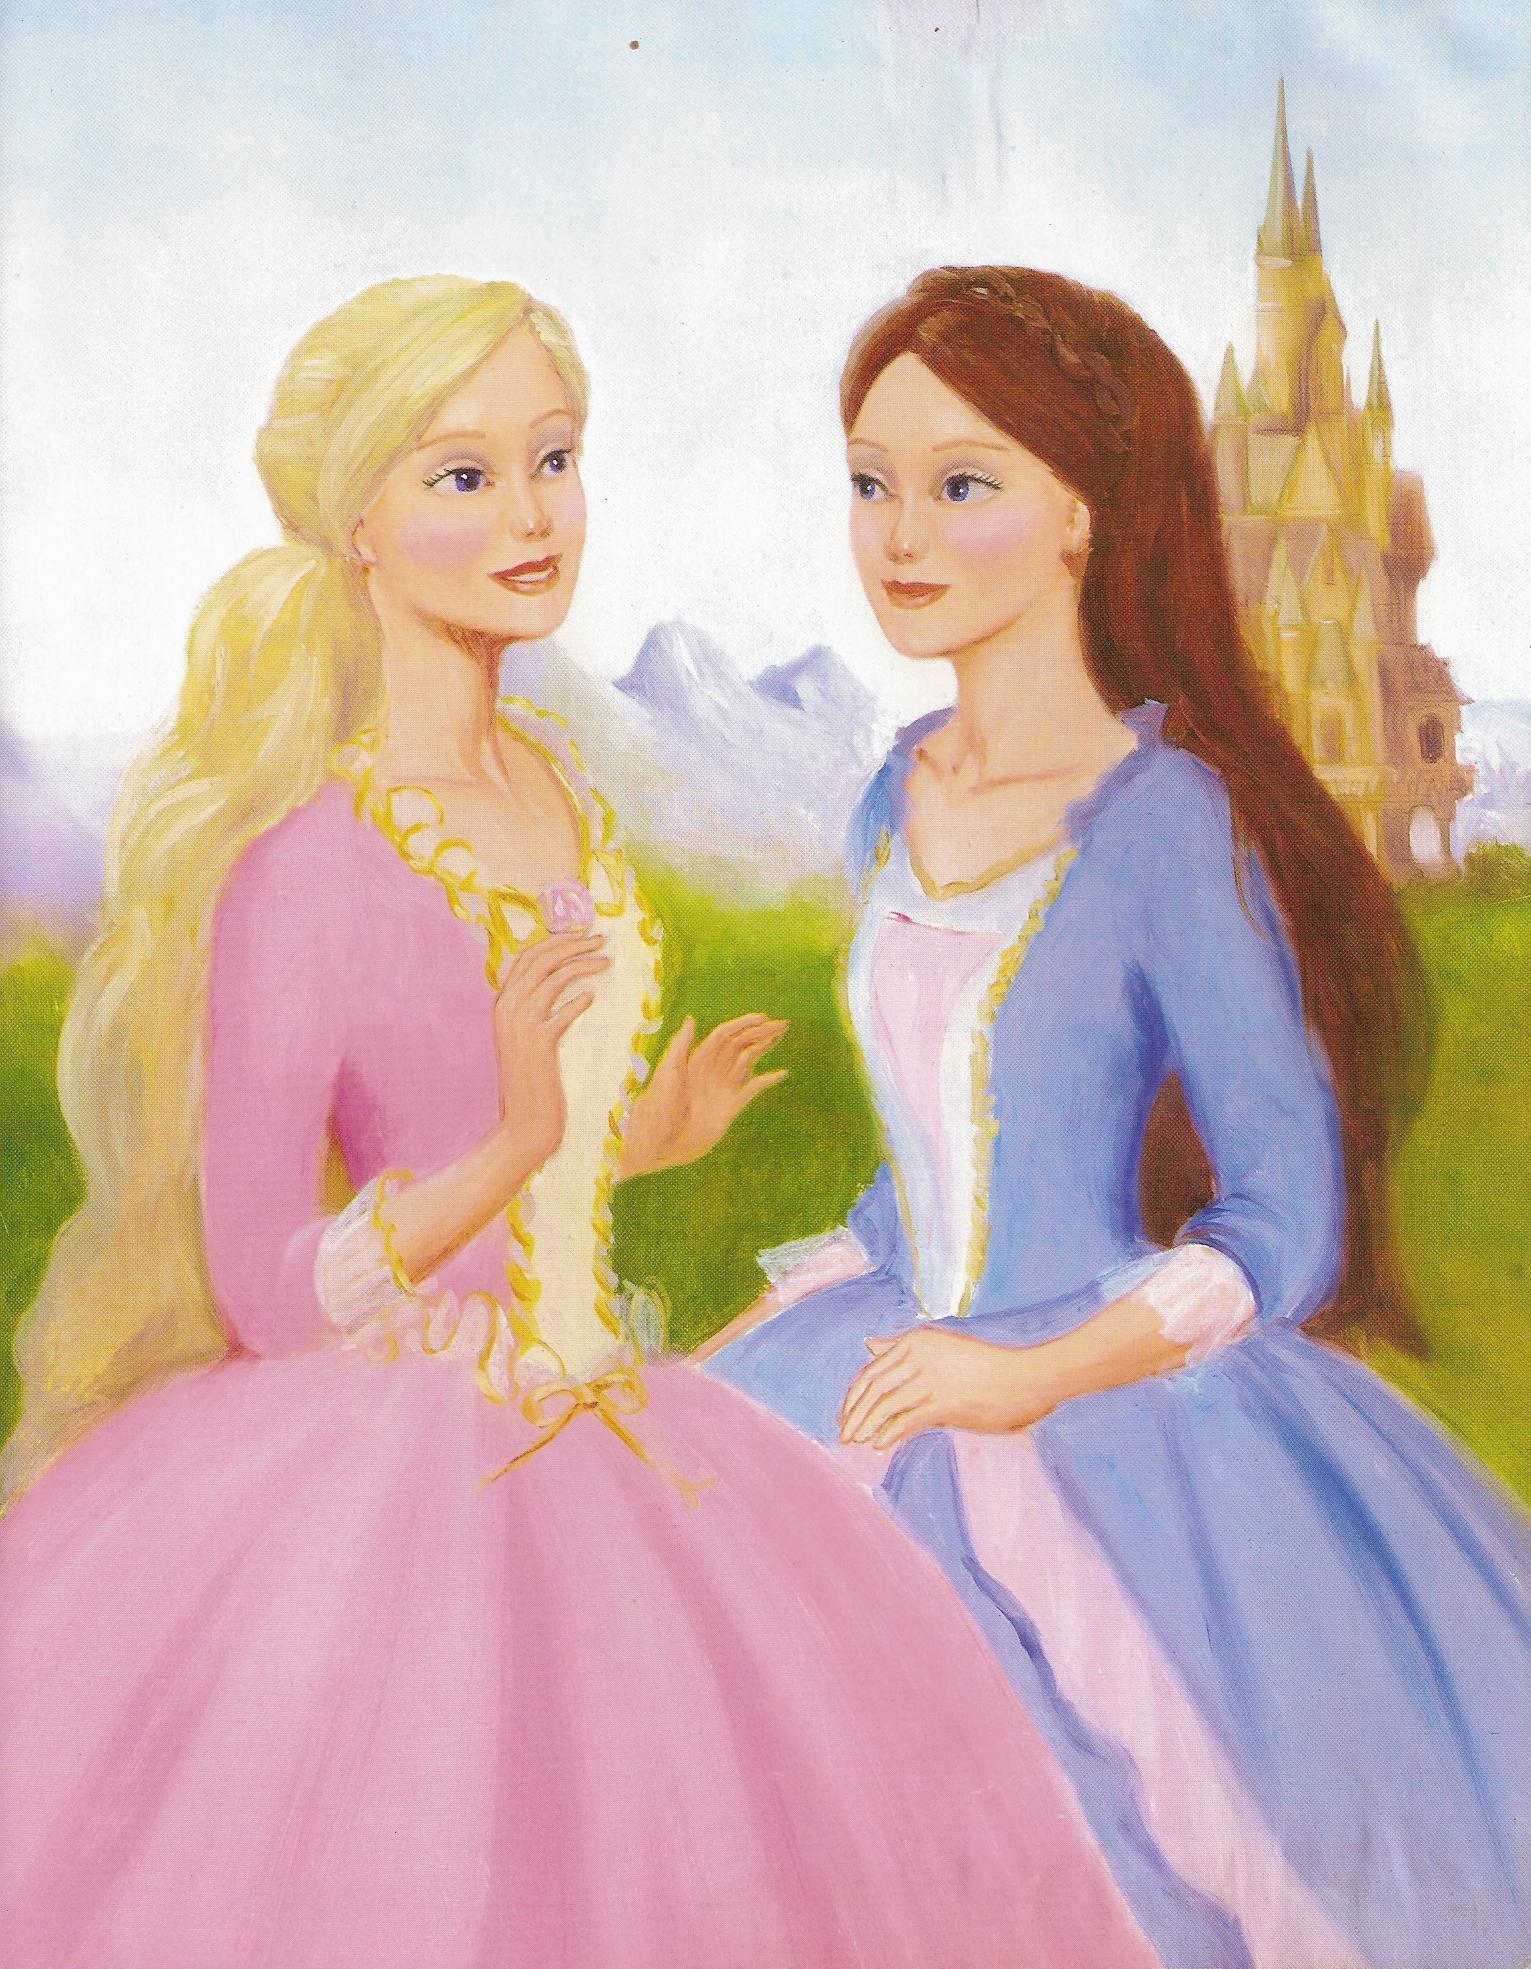 Princess And The Pauper Barbie Princess And The Pauper As The Princess And The Pauper